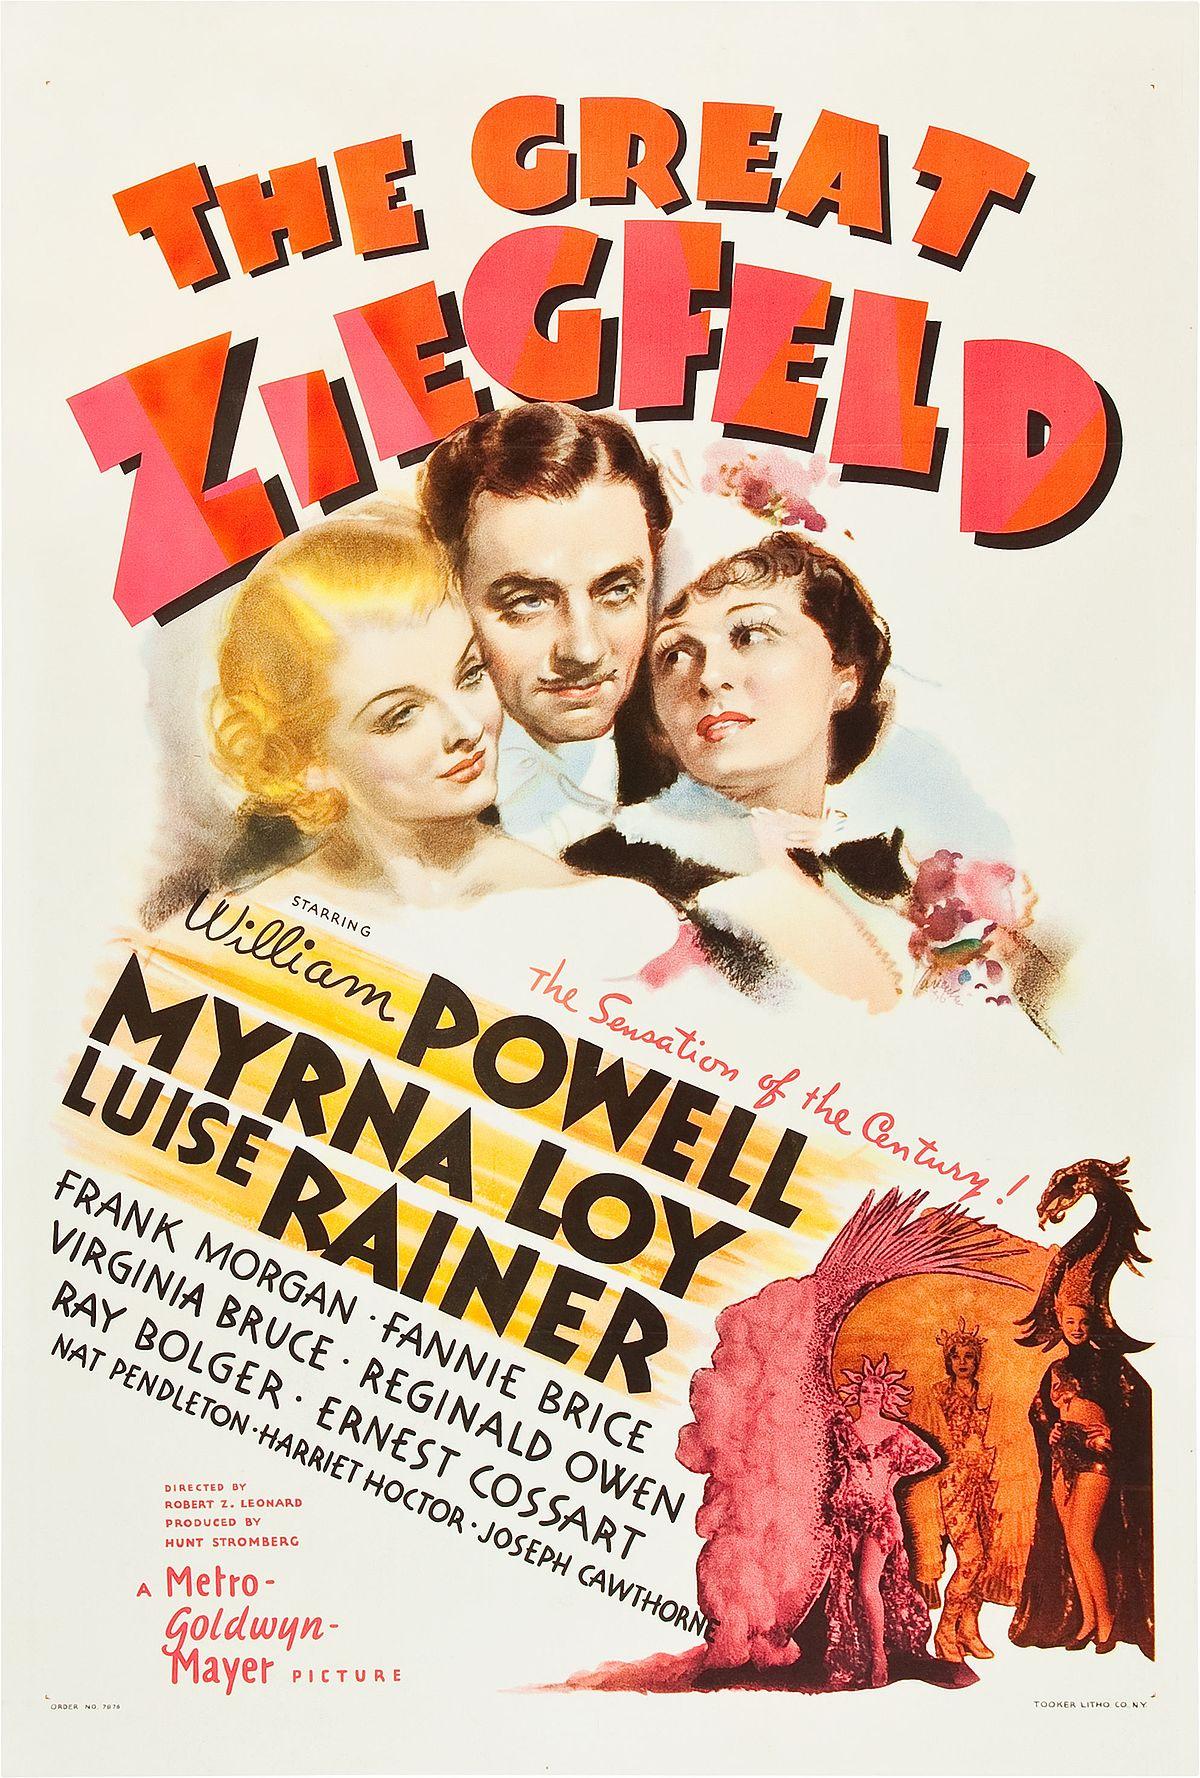 The Great Ziegfeld - Wikipedia